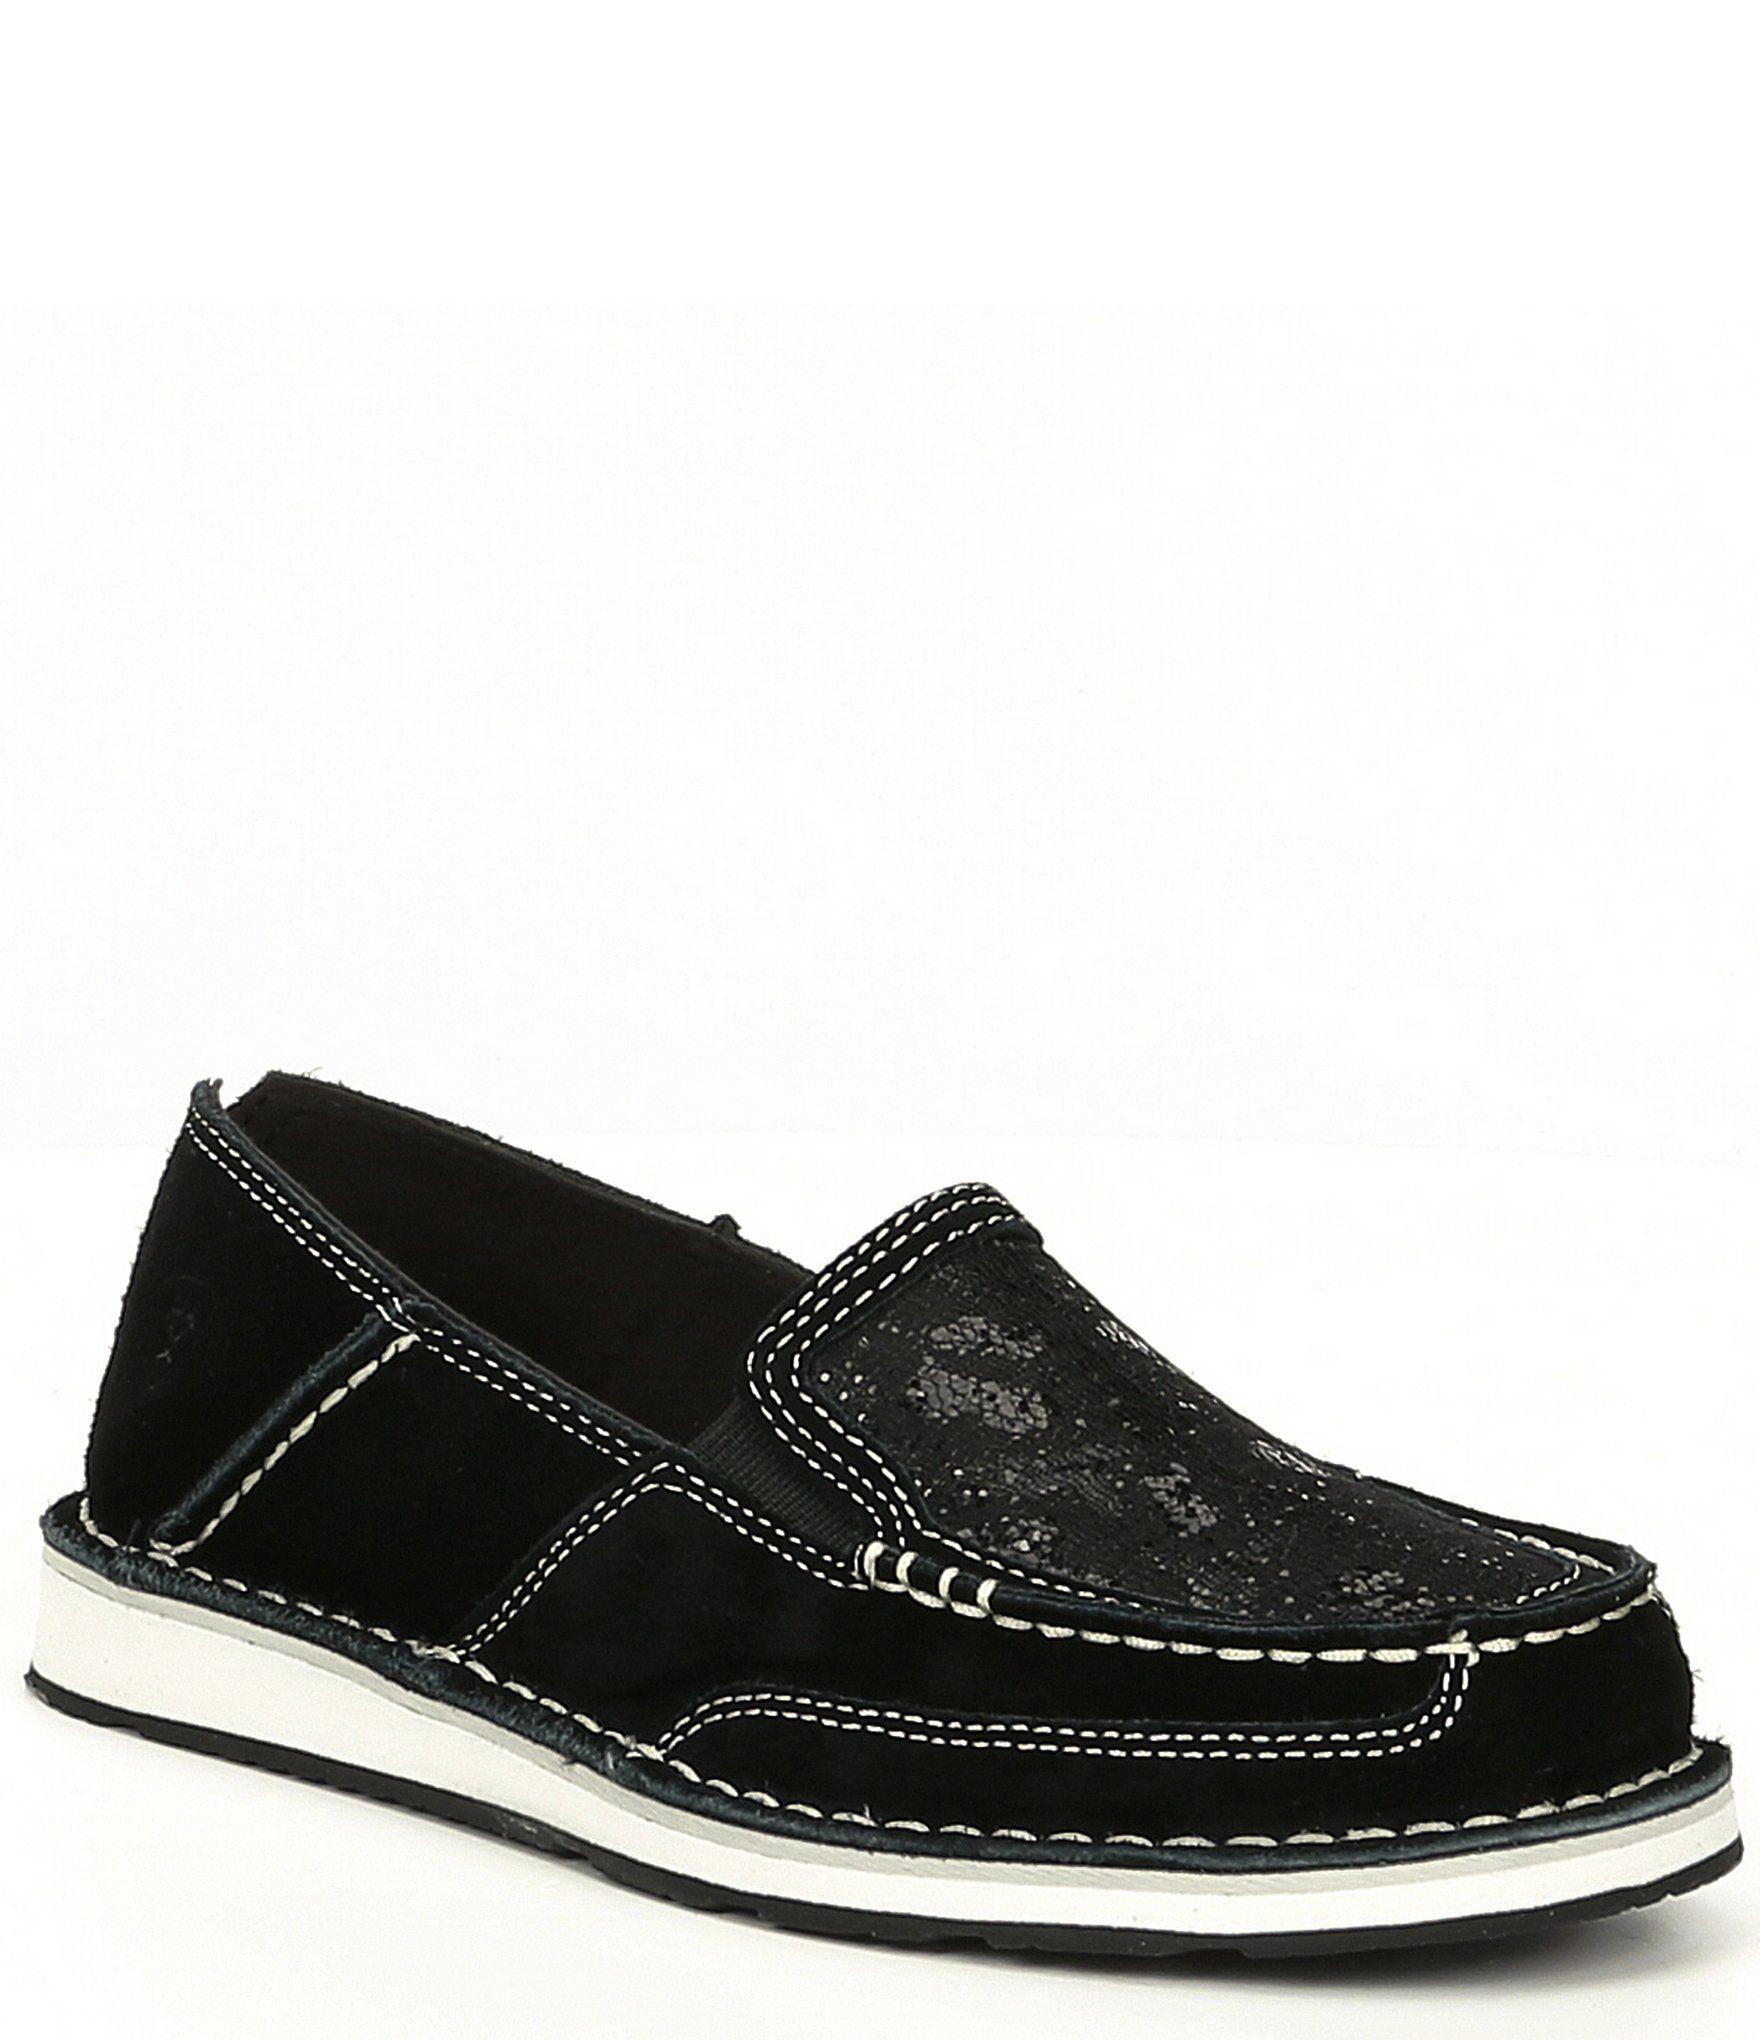 Ariat Cruiser Sequin Slip On Shoes – Black 6.5M